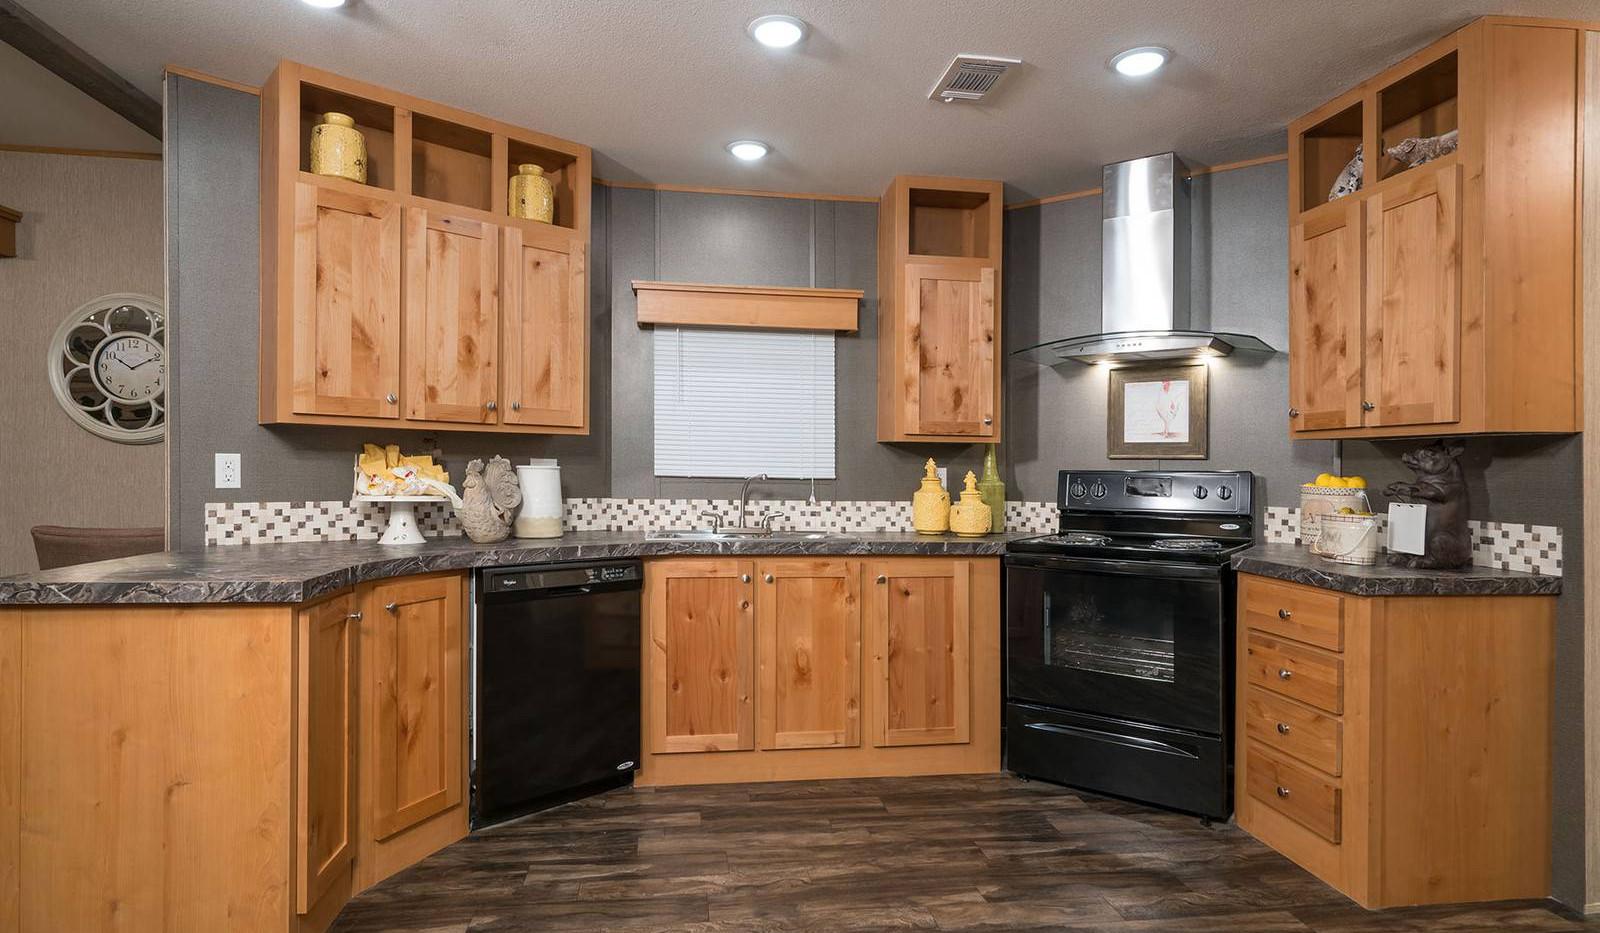 1-select-1676c-kitchen-1-1600x1068.jpg